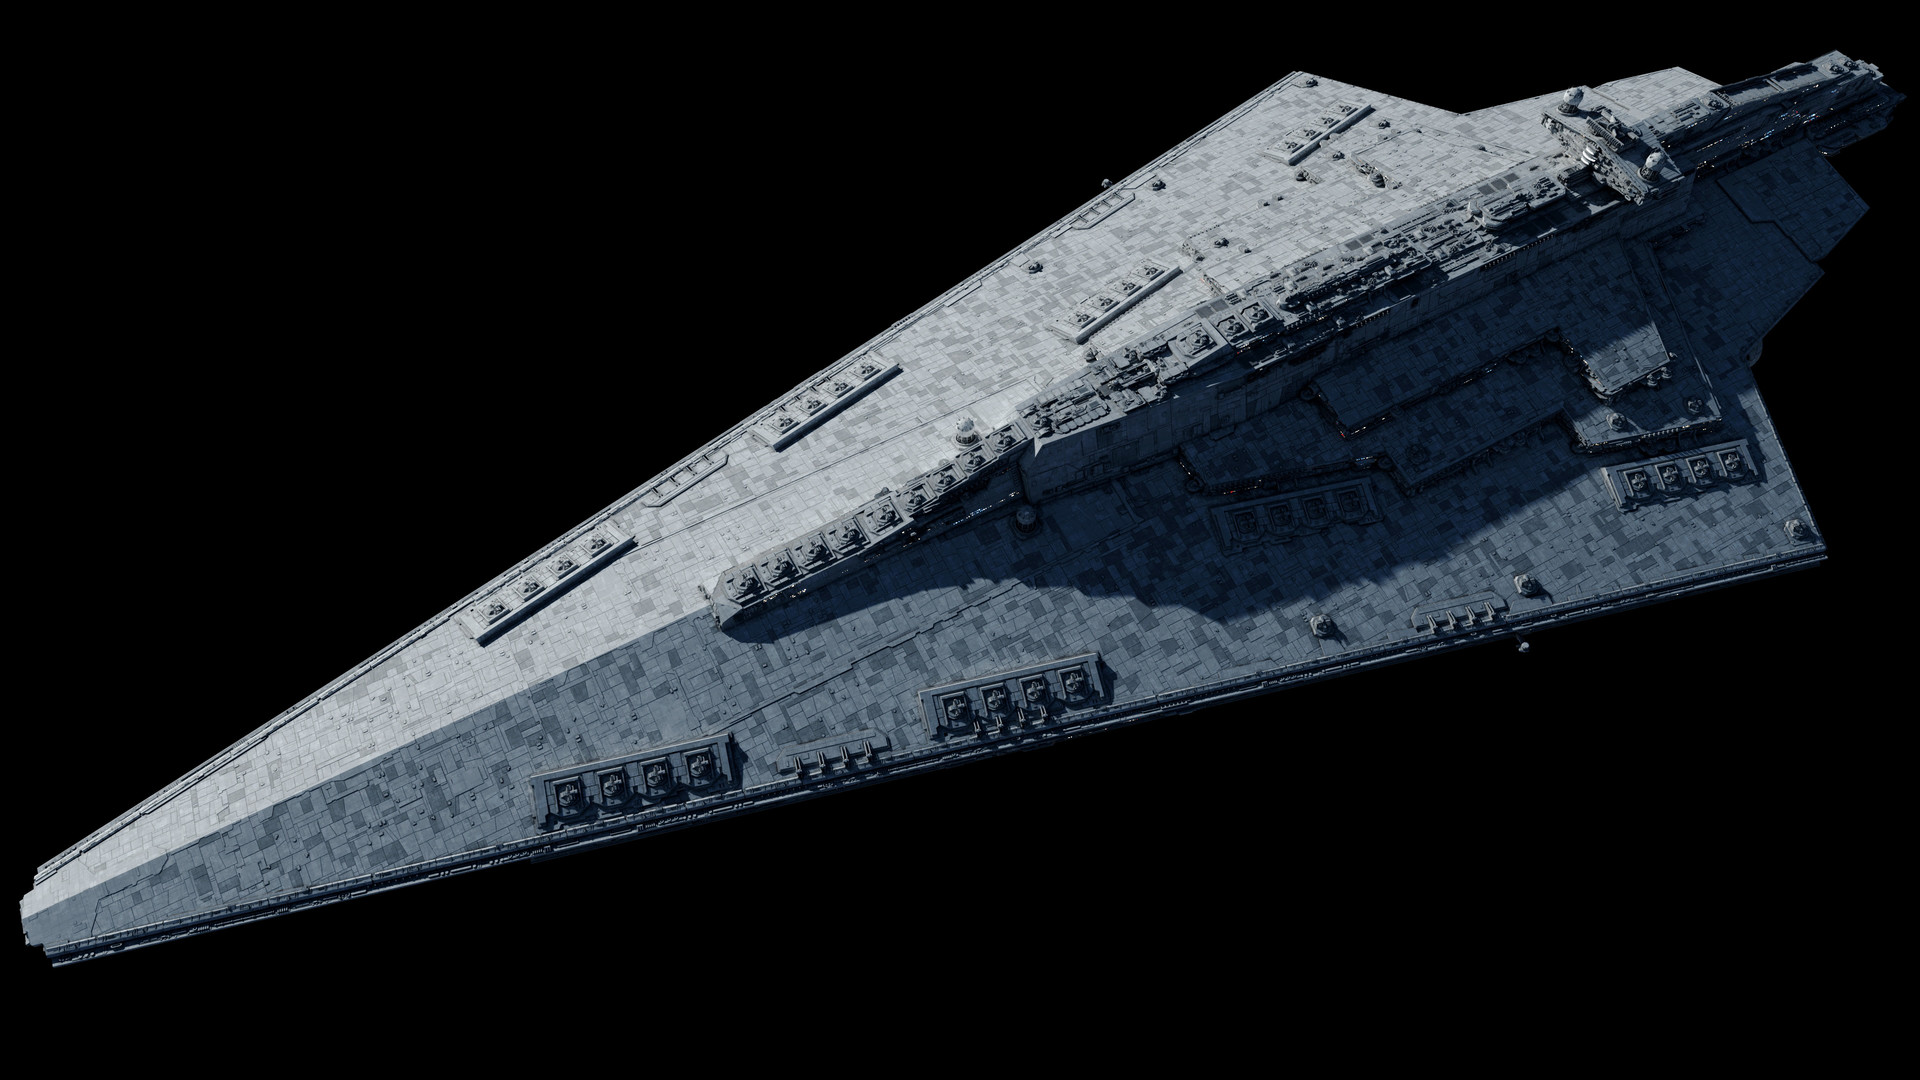 Ansel hsiao cruiser28